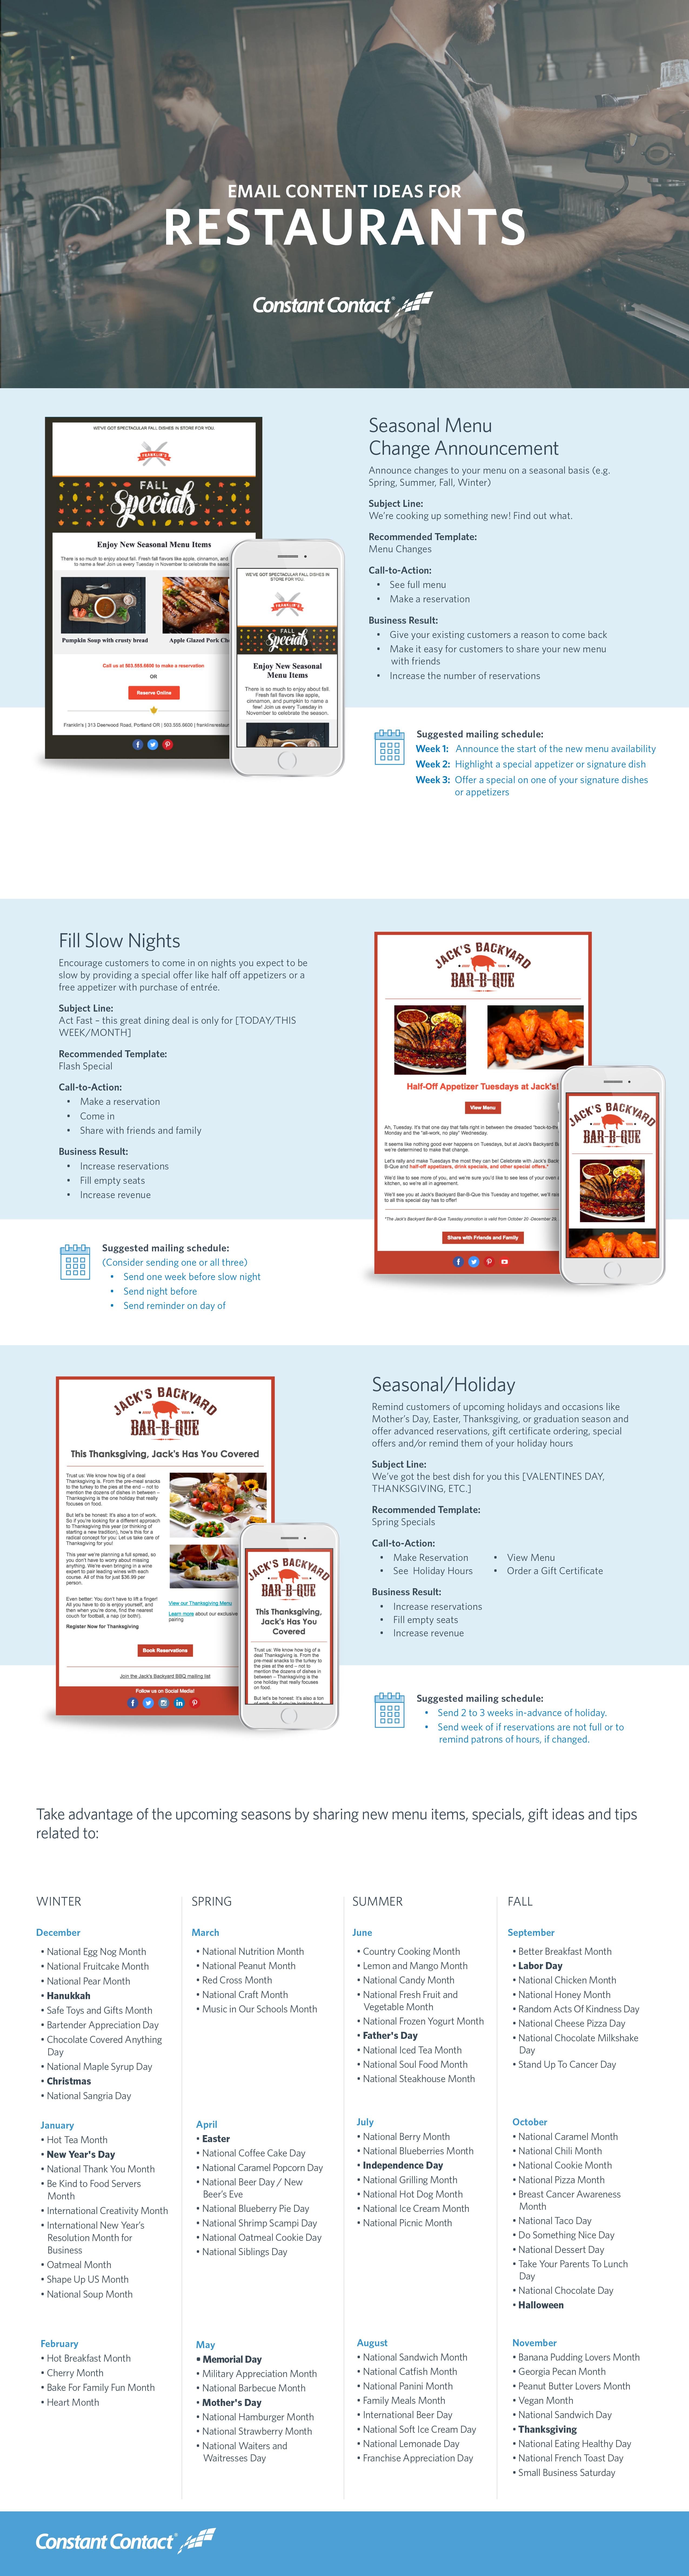 Restaurant email marketing infographic